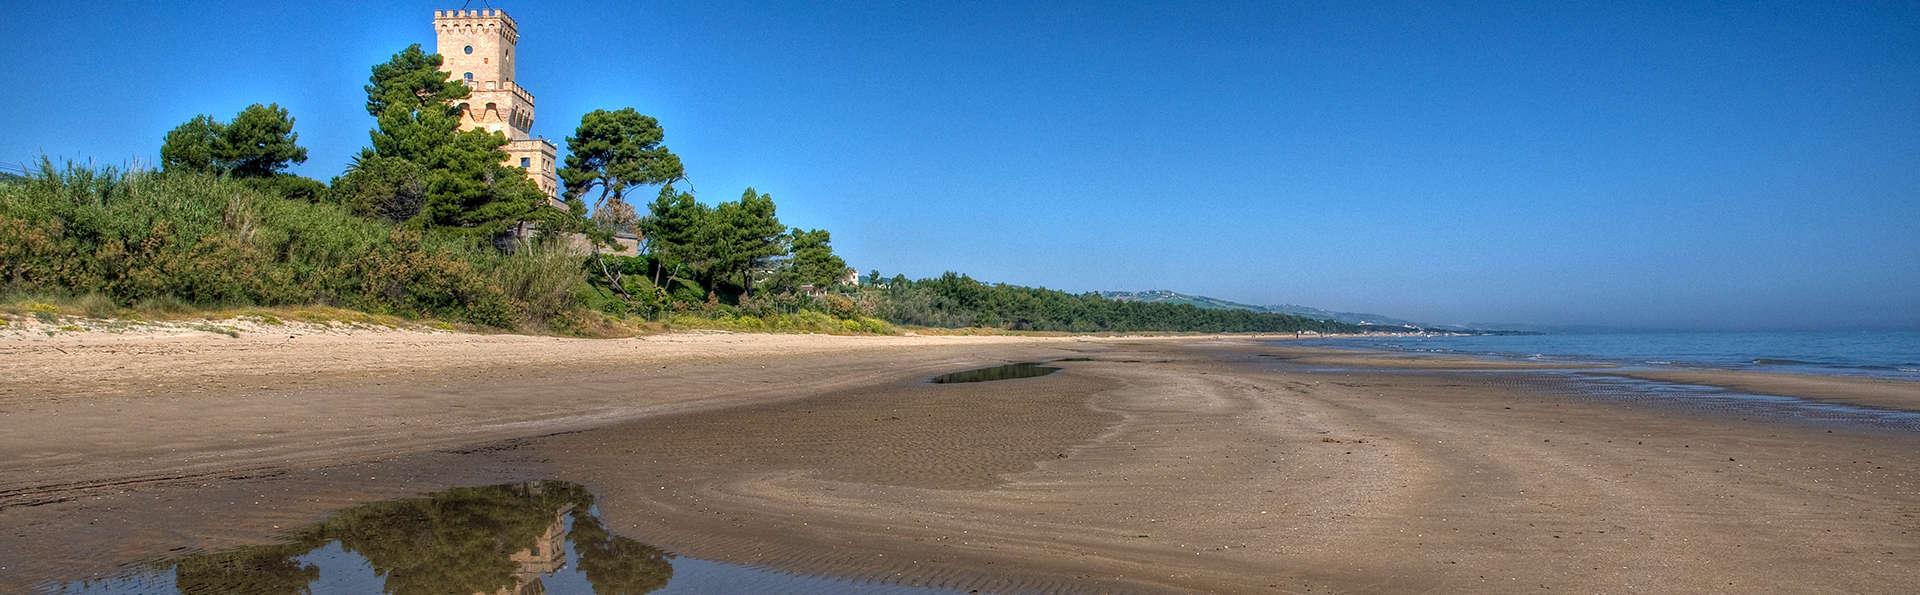 Strand van Pineto